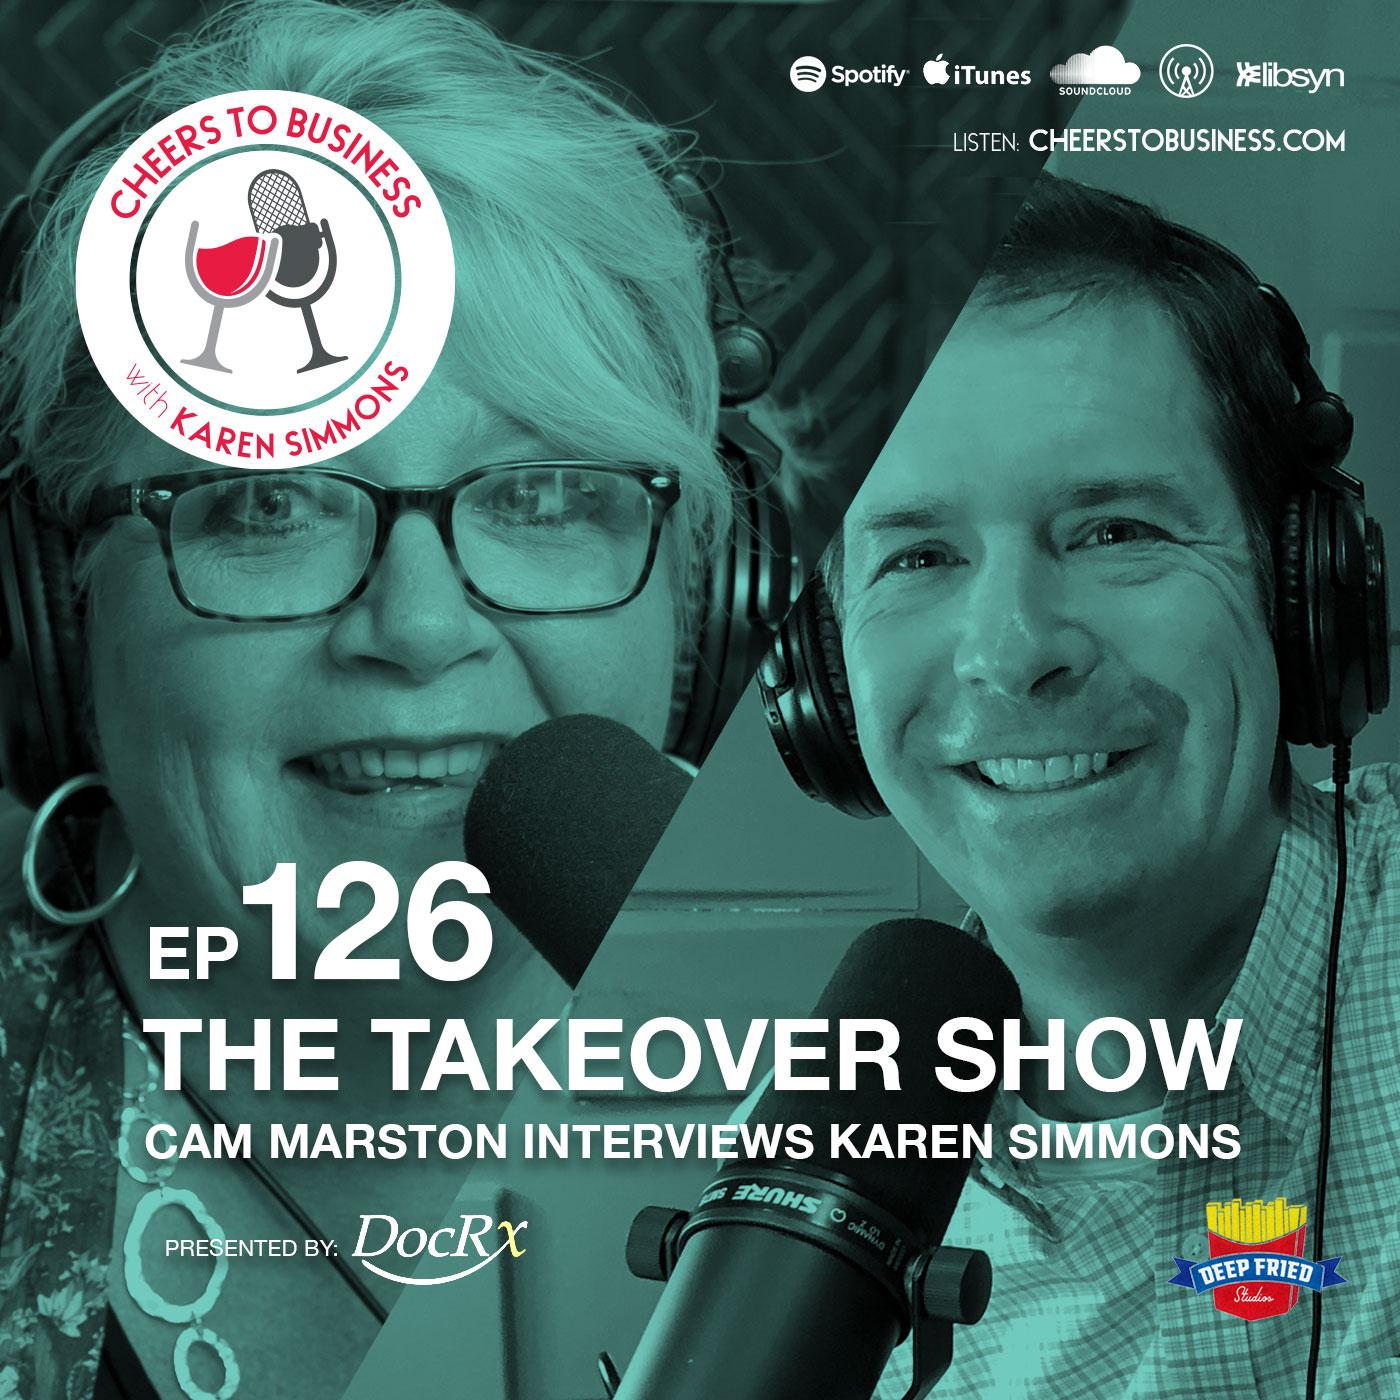 Cam Marston Interviews Karen: The Takeover Show show art